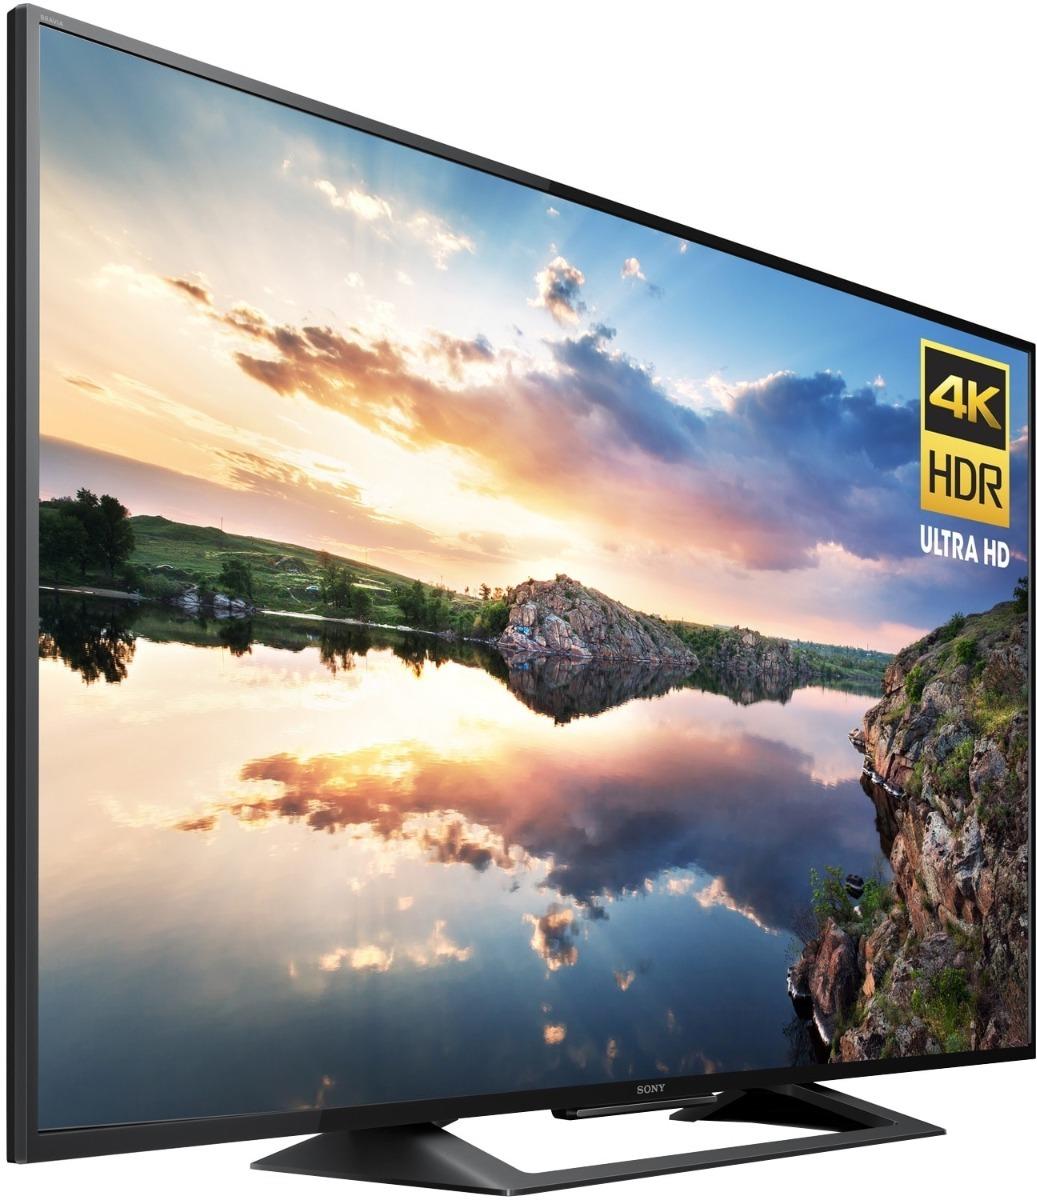 28533355ce33 Oferta Pantalla Smart Tv 70 Pulgadas Led 4k Sony Hdr - $ 35,990.00 ...